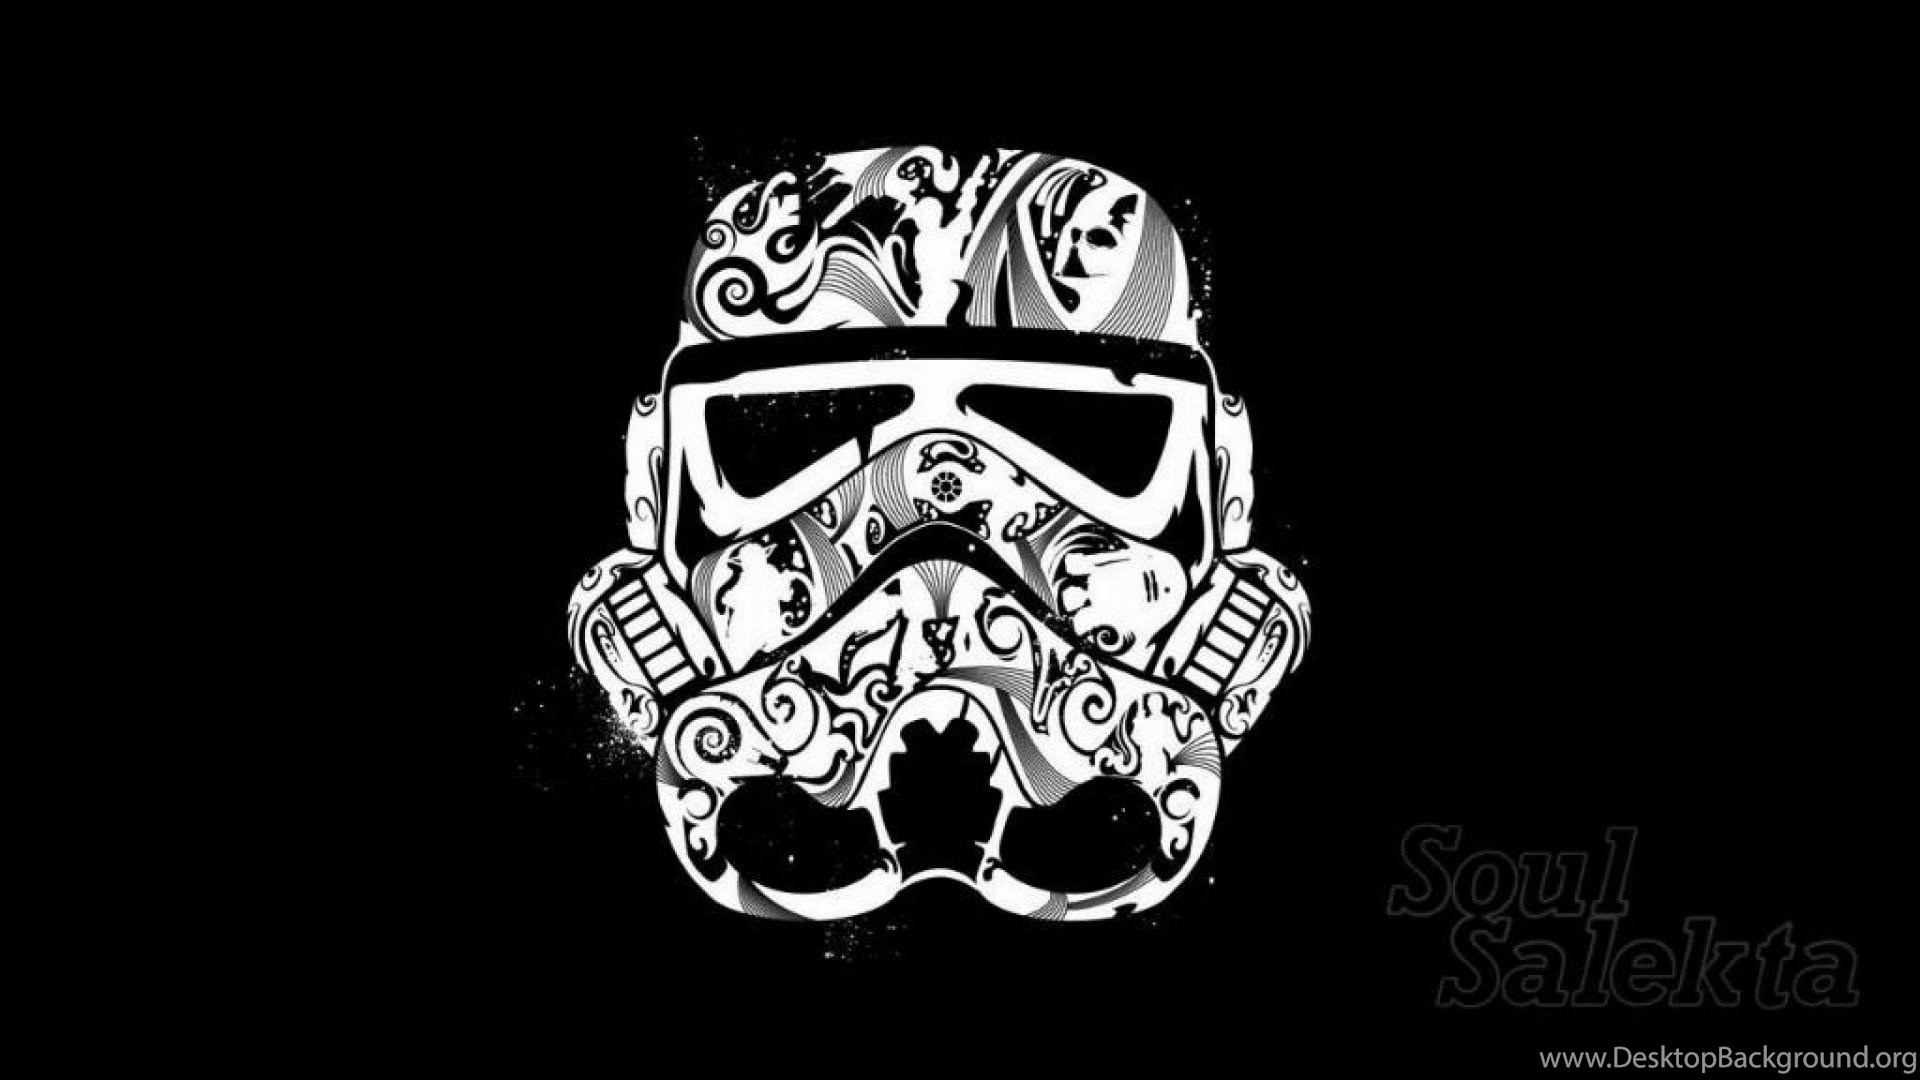 Stormtroopers Graffiti Wallpapers Desktop Background